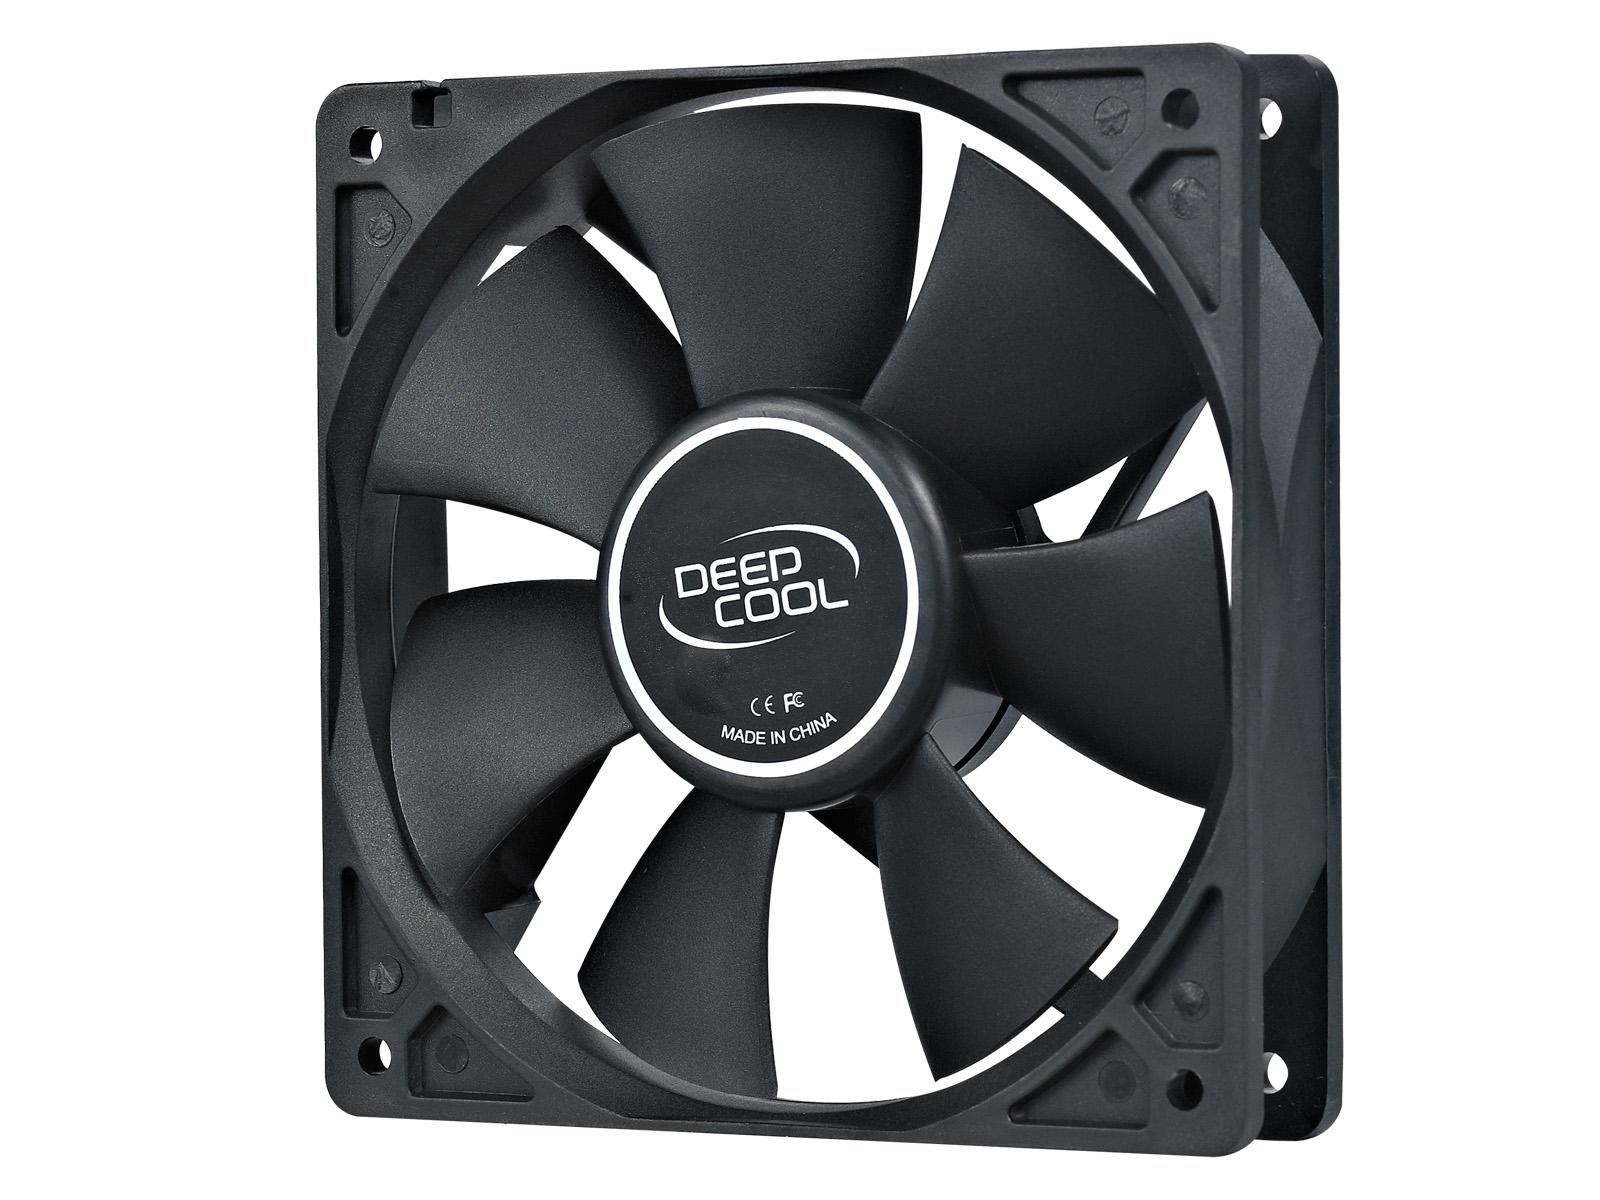 DEEPCOOL DeepCool XFAN120 120x120 mm venitlator za kuciste, hydro bearing Ventilatori i kuleri za kućišta